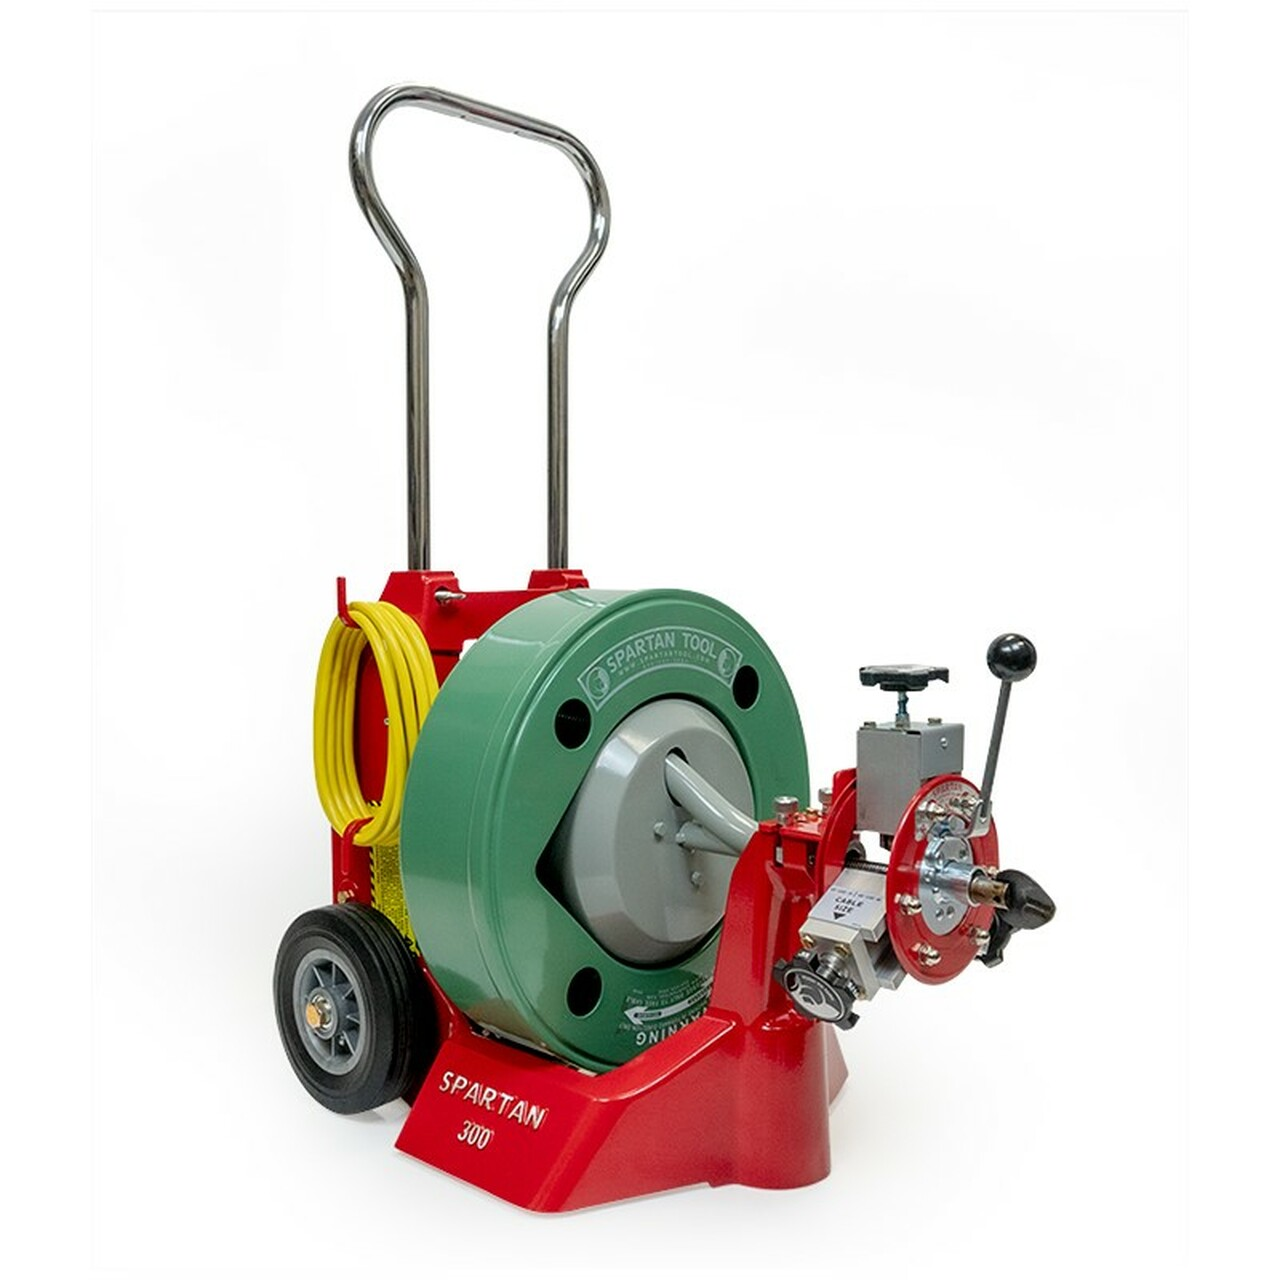 Spartan Tool Model 300 Drain Cleaning Machine - 04221458   Spartan 300 Sewer Machine Wire Diagram      Spartan Tool